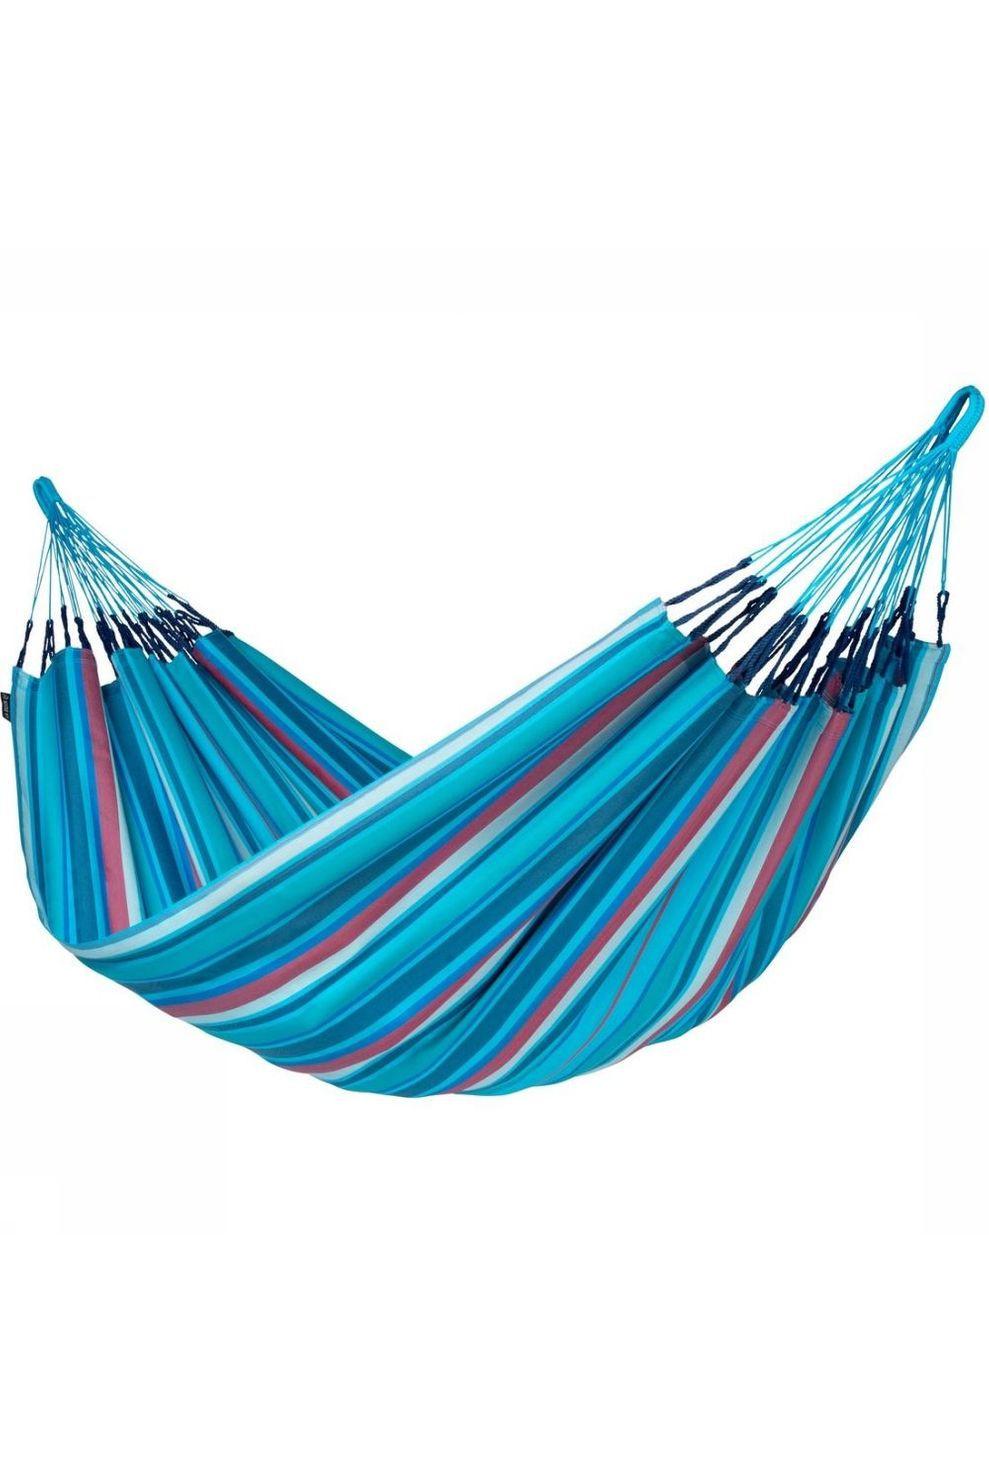 La Siesta Hangmat Brisa Double - Blauw/Rood